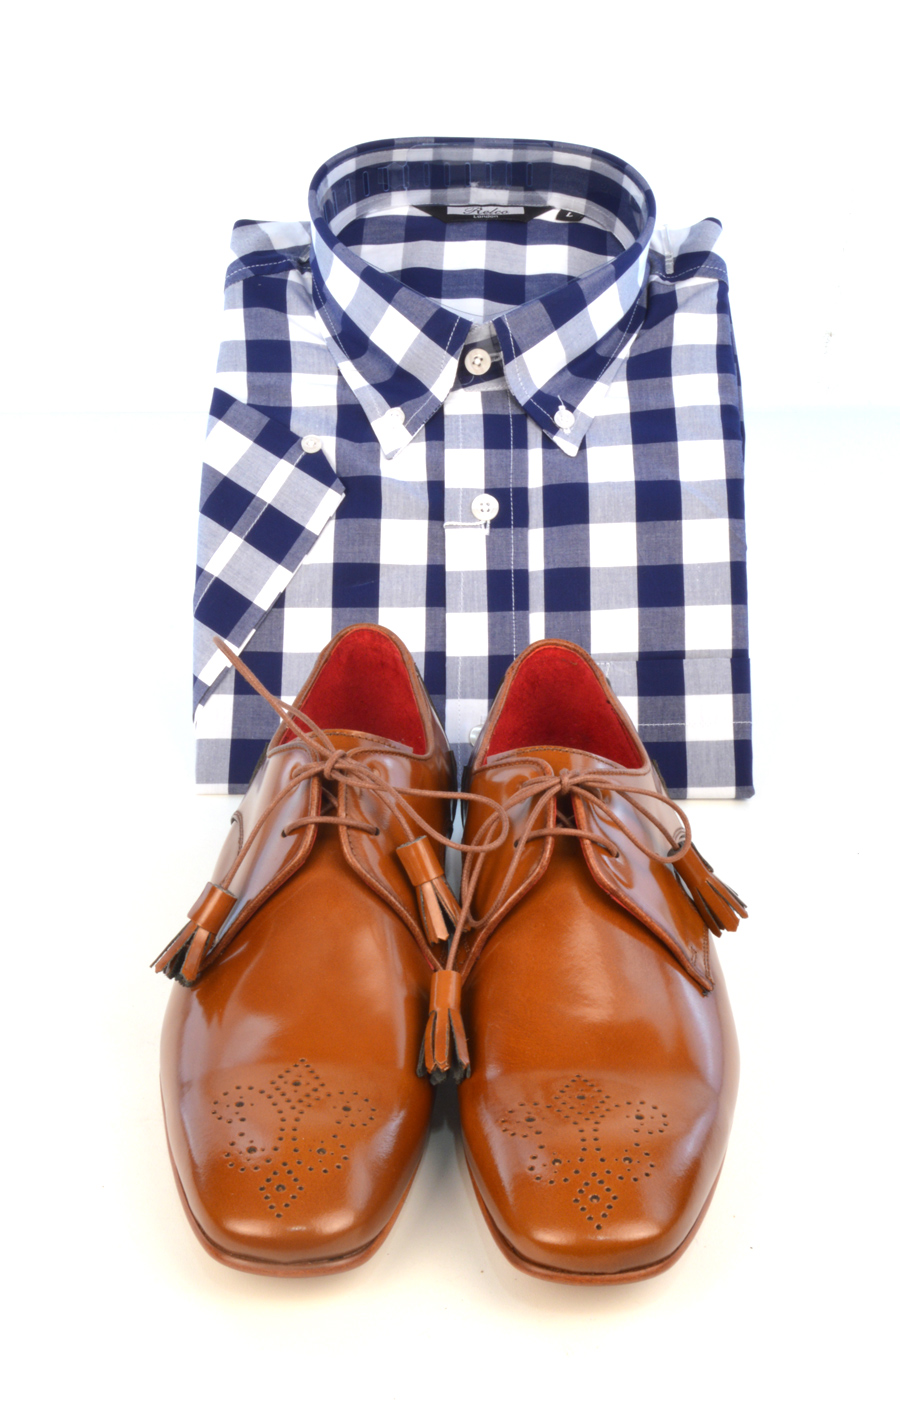 modshoes-jeffery-west-and-check-shirt-01